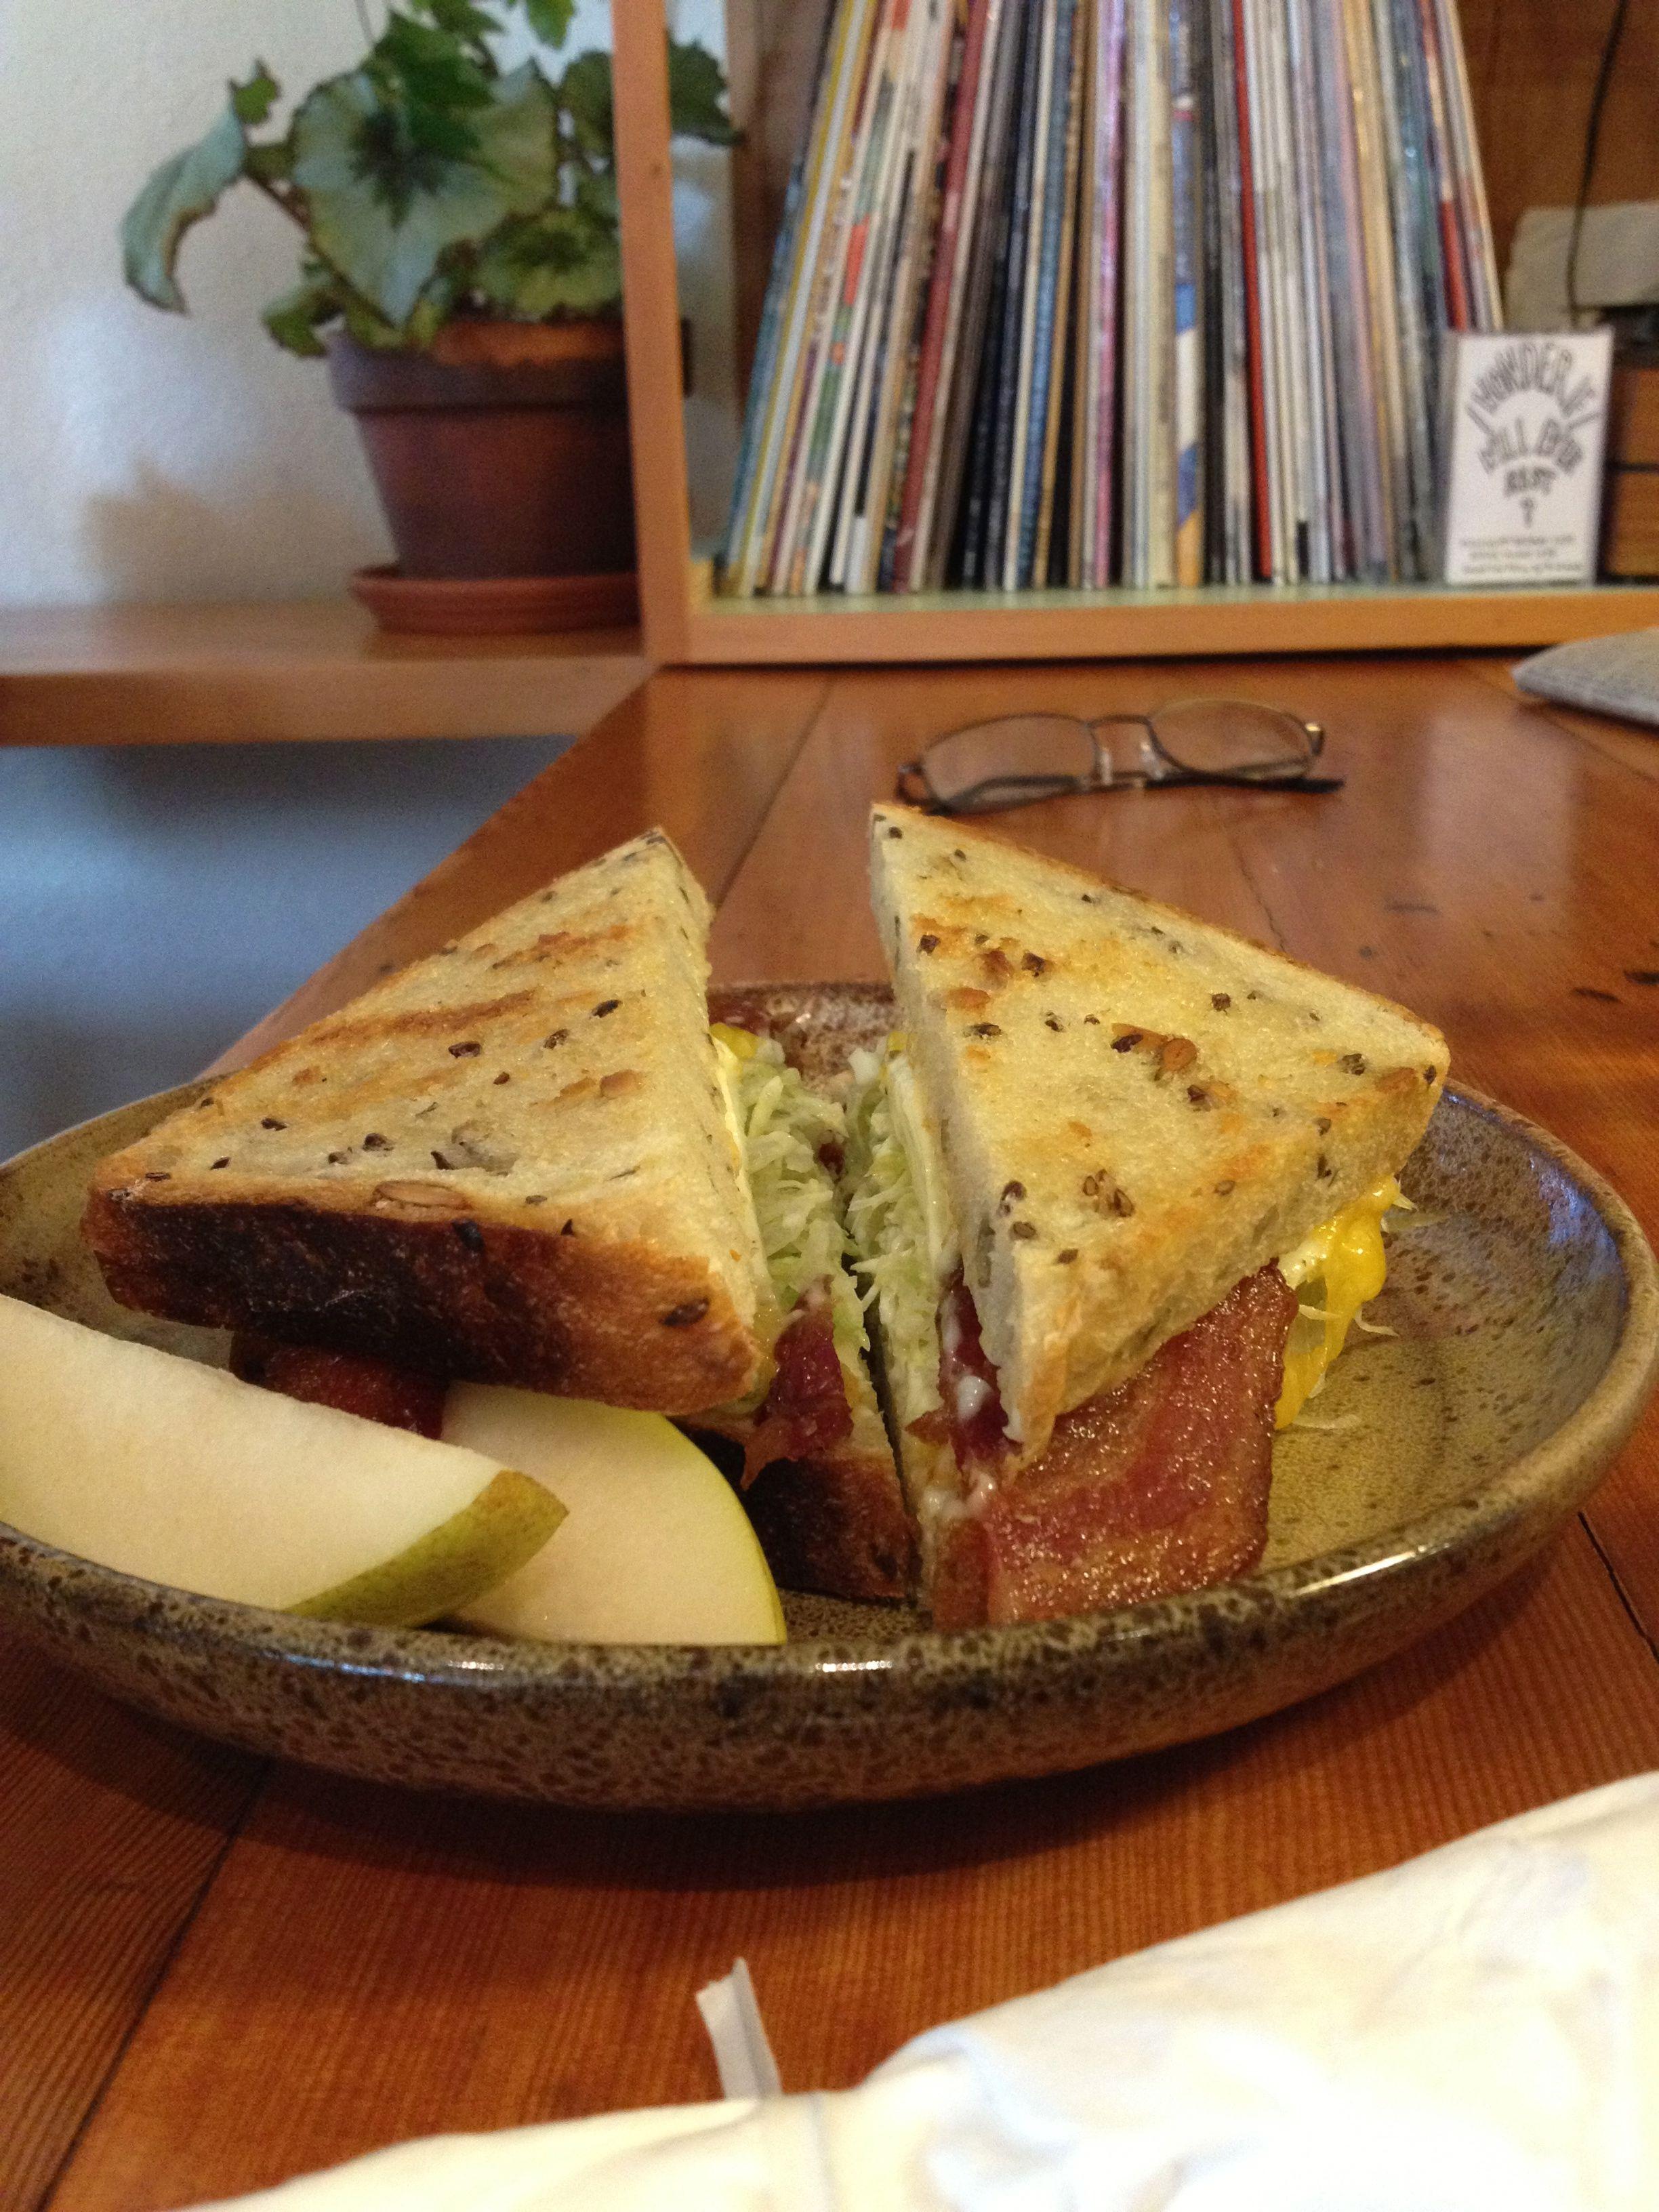 Egg and bacon sandwich at Sweedeedee Bacon sandwich